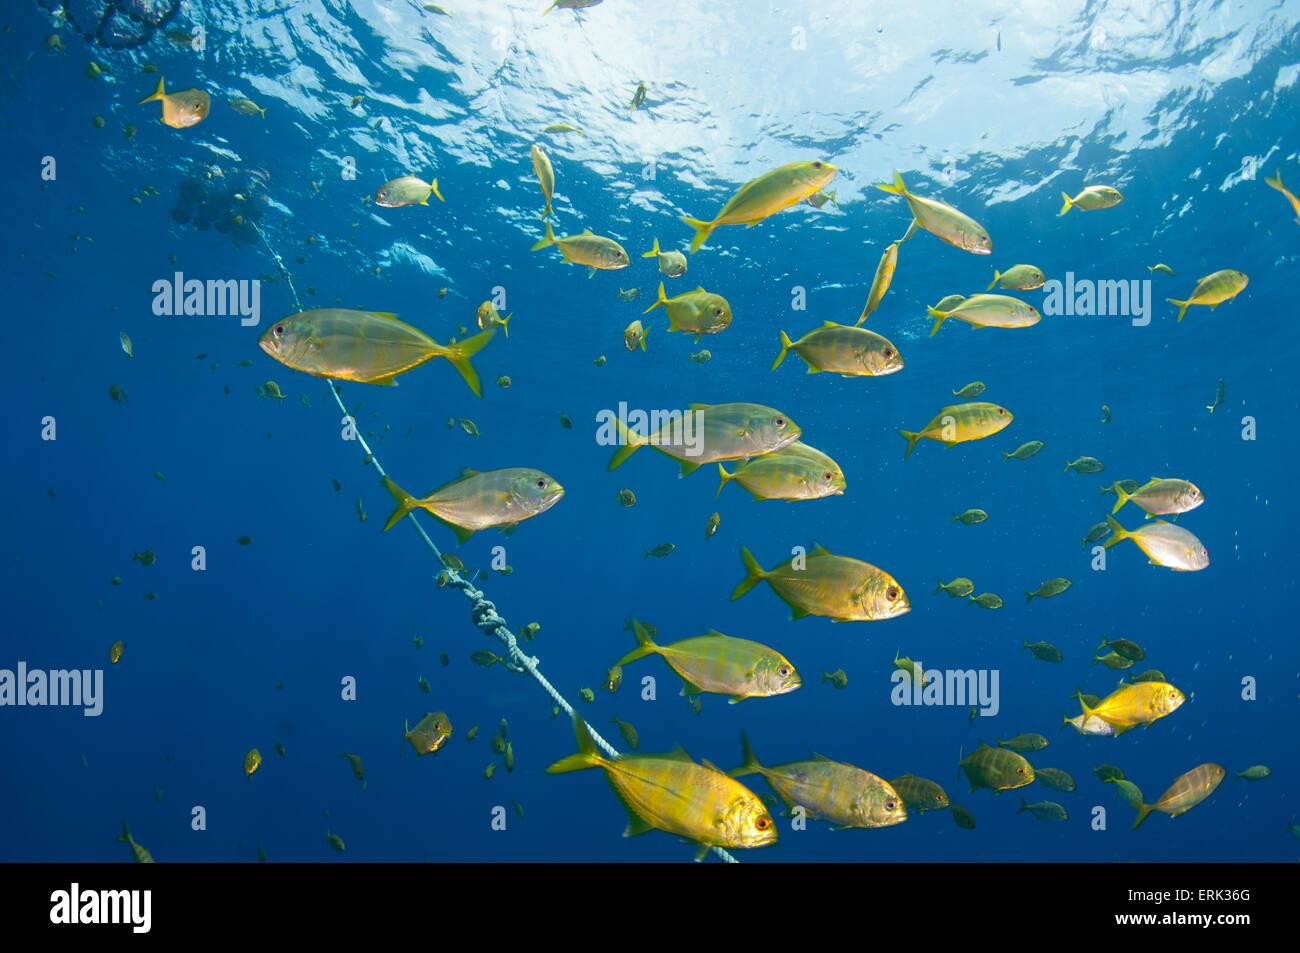 School of Juvenile Bigeye Trevallies, Caranx sexfasciatus, under Fish Aggregation Device, South Male Atoll, Maldives - Stock Image